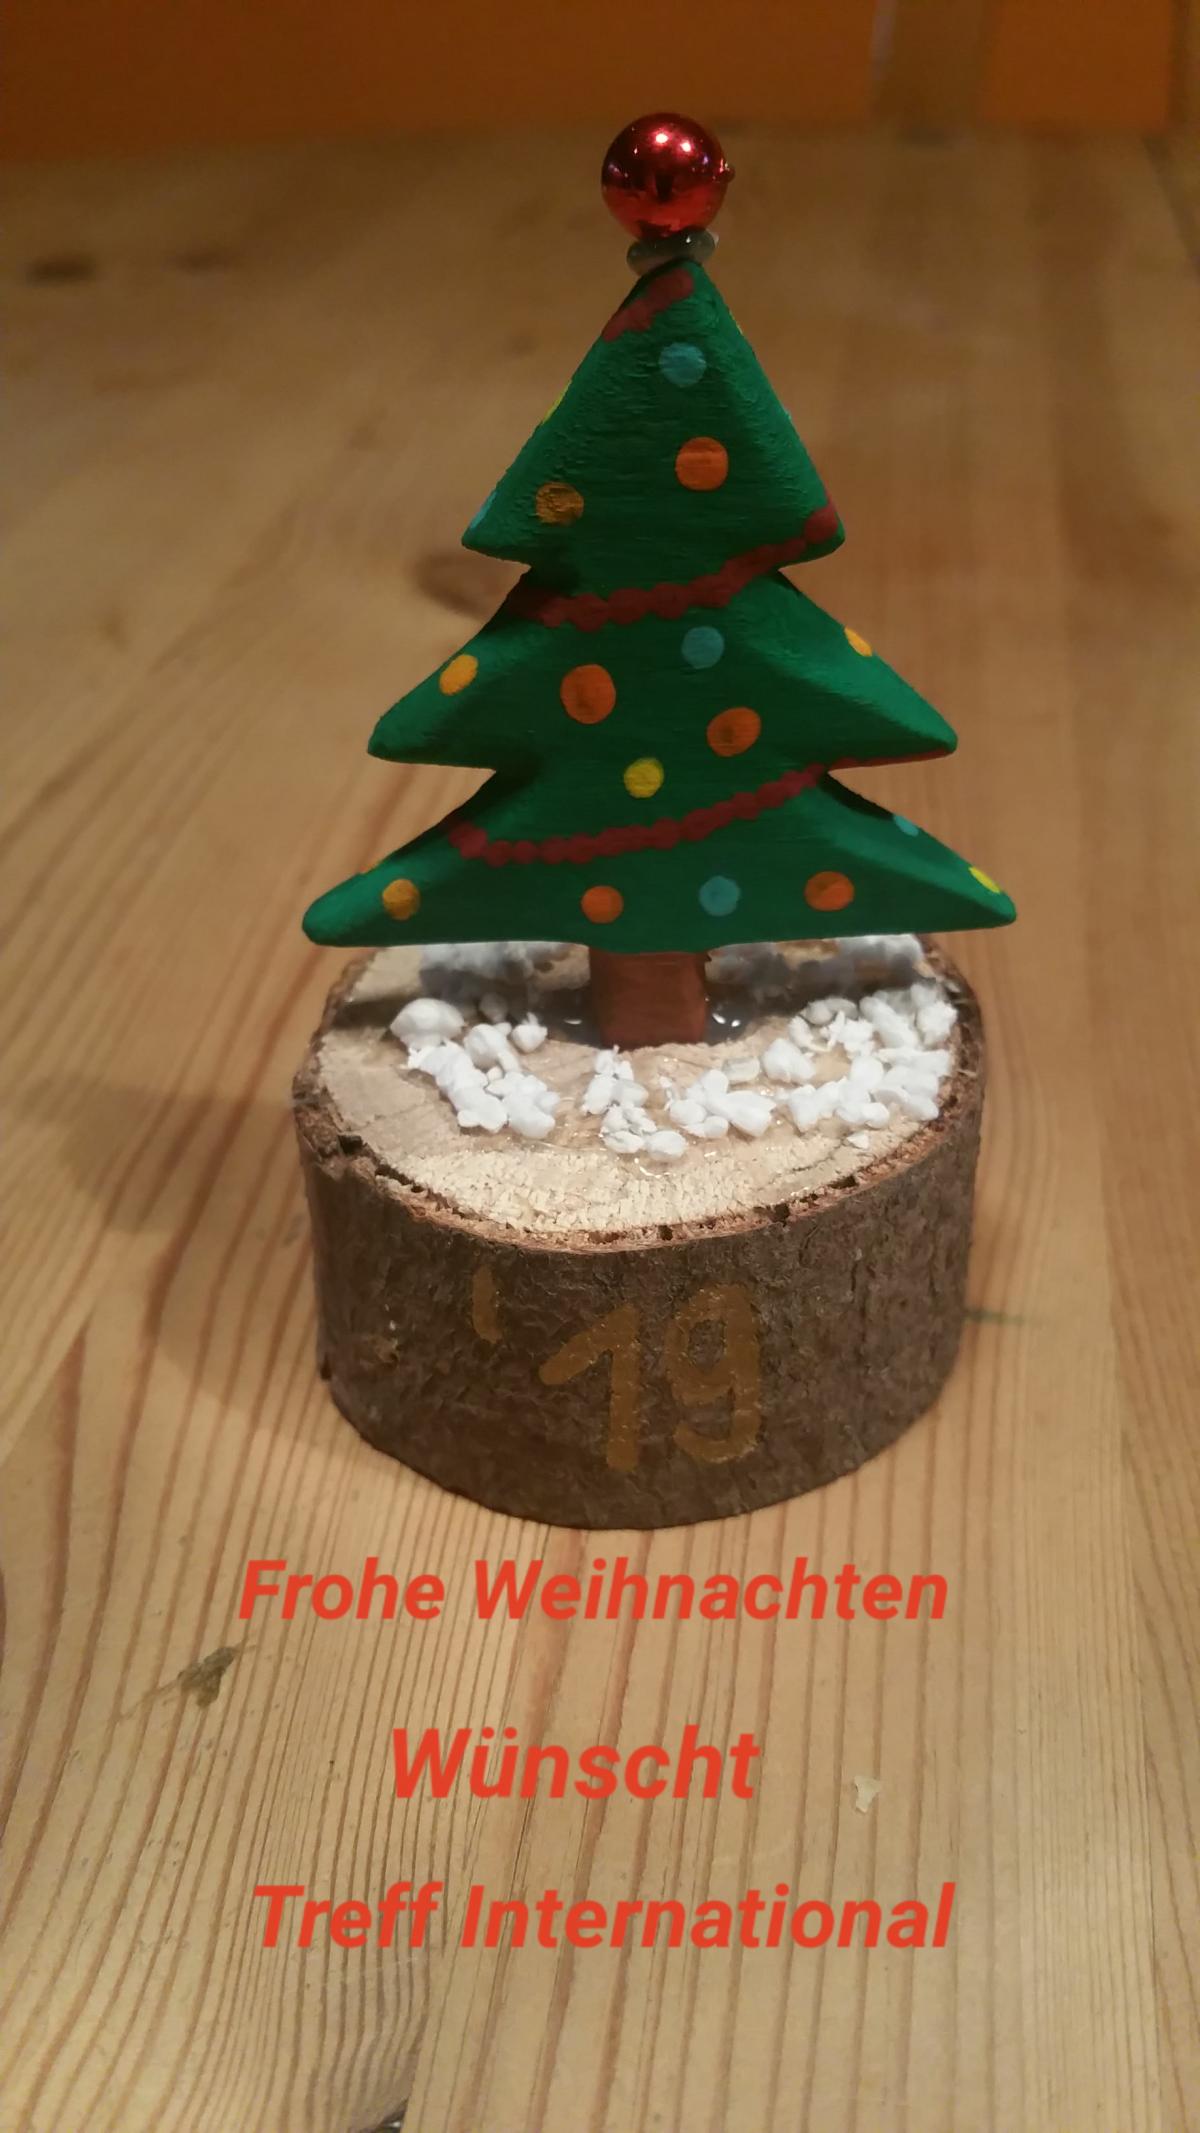 Frohe Weihnachten wünscht das Team der IG Integration +